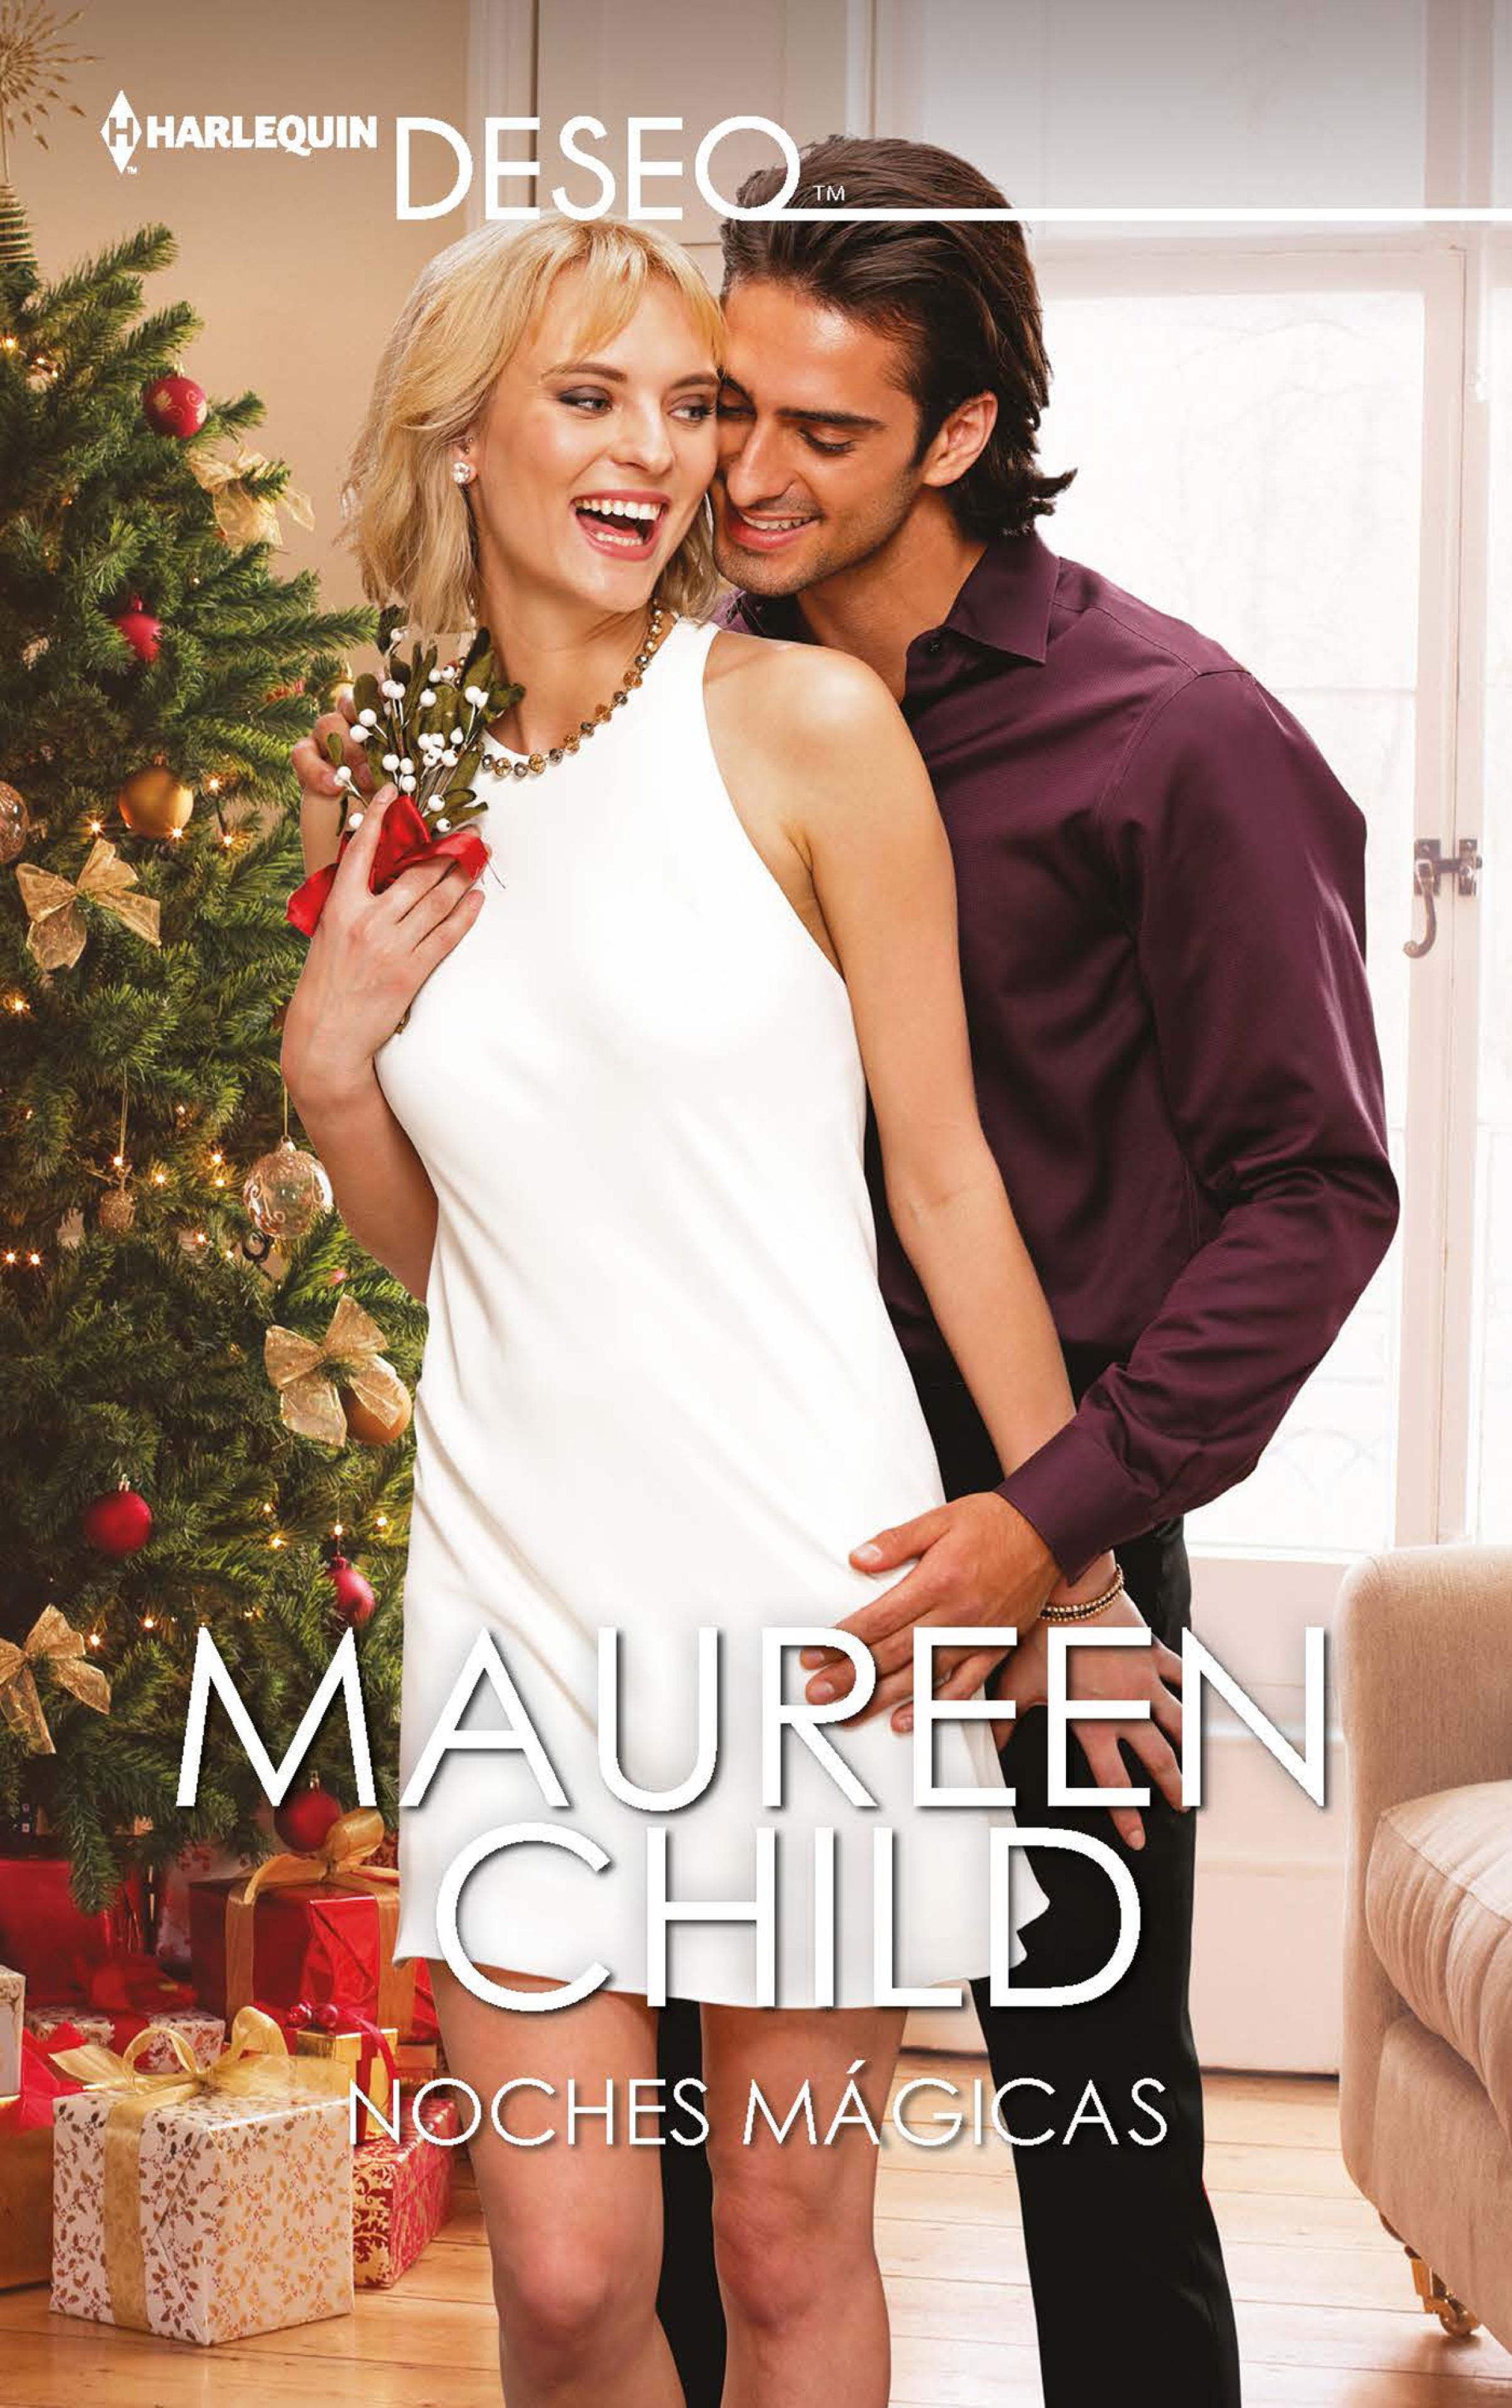 Maureen Child Noches mágicas maureen child test na miłość